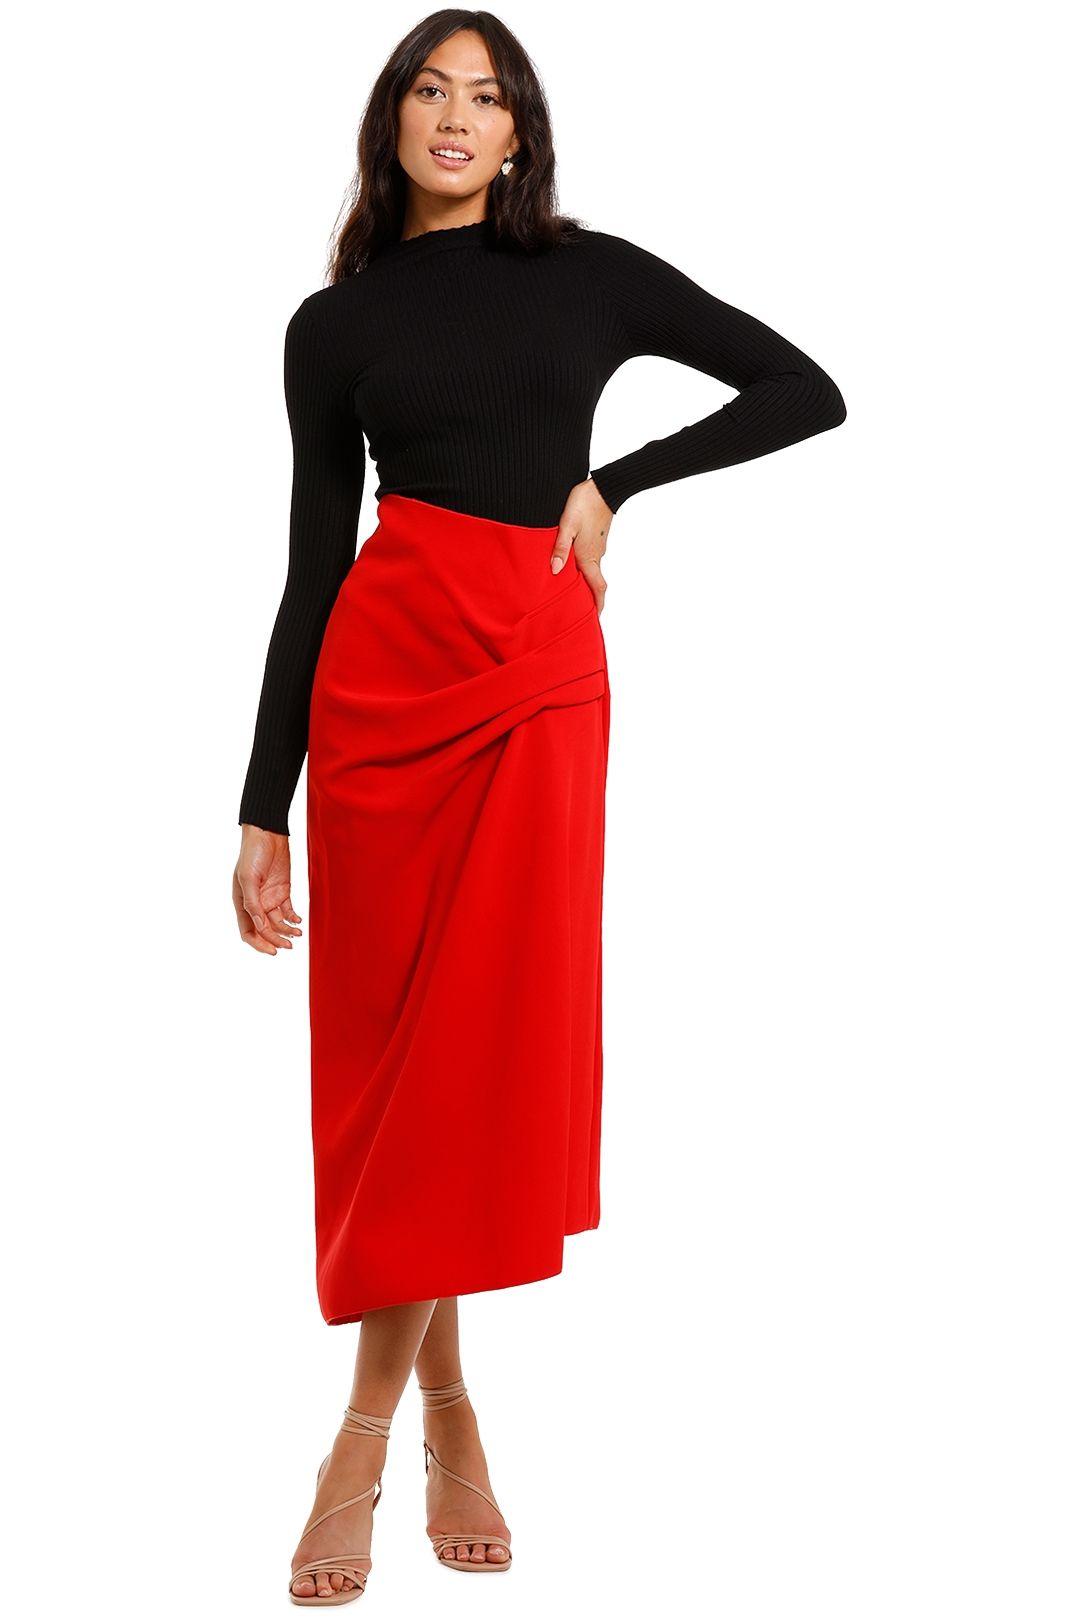 Acler Thistle Skirt Red asymmetric